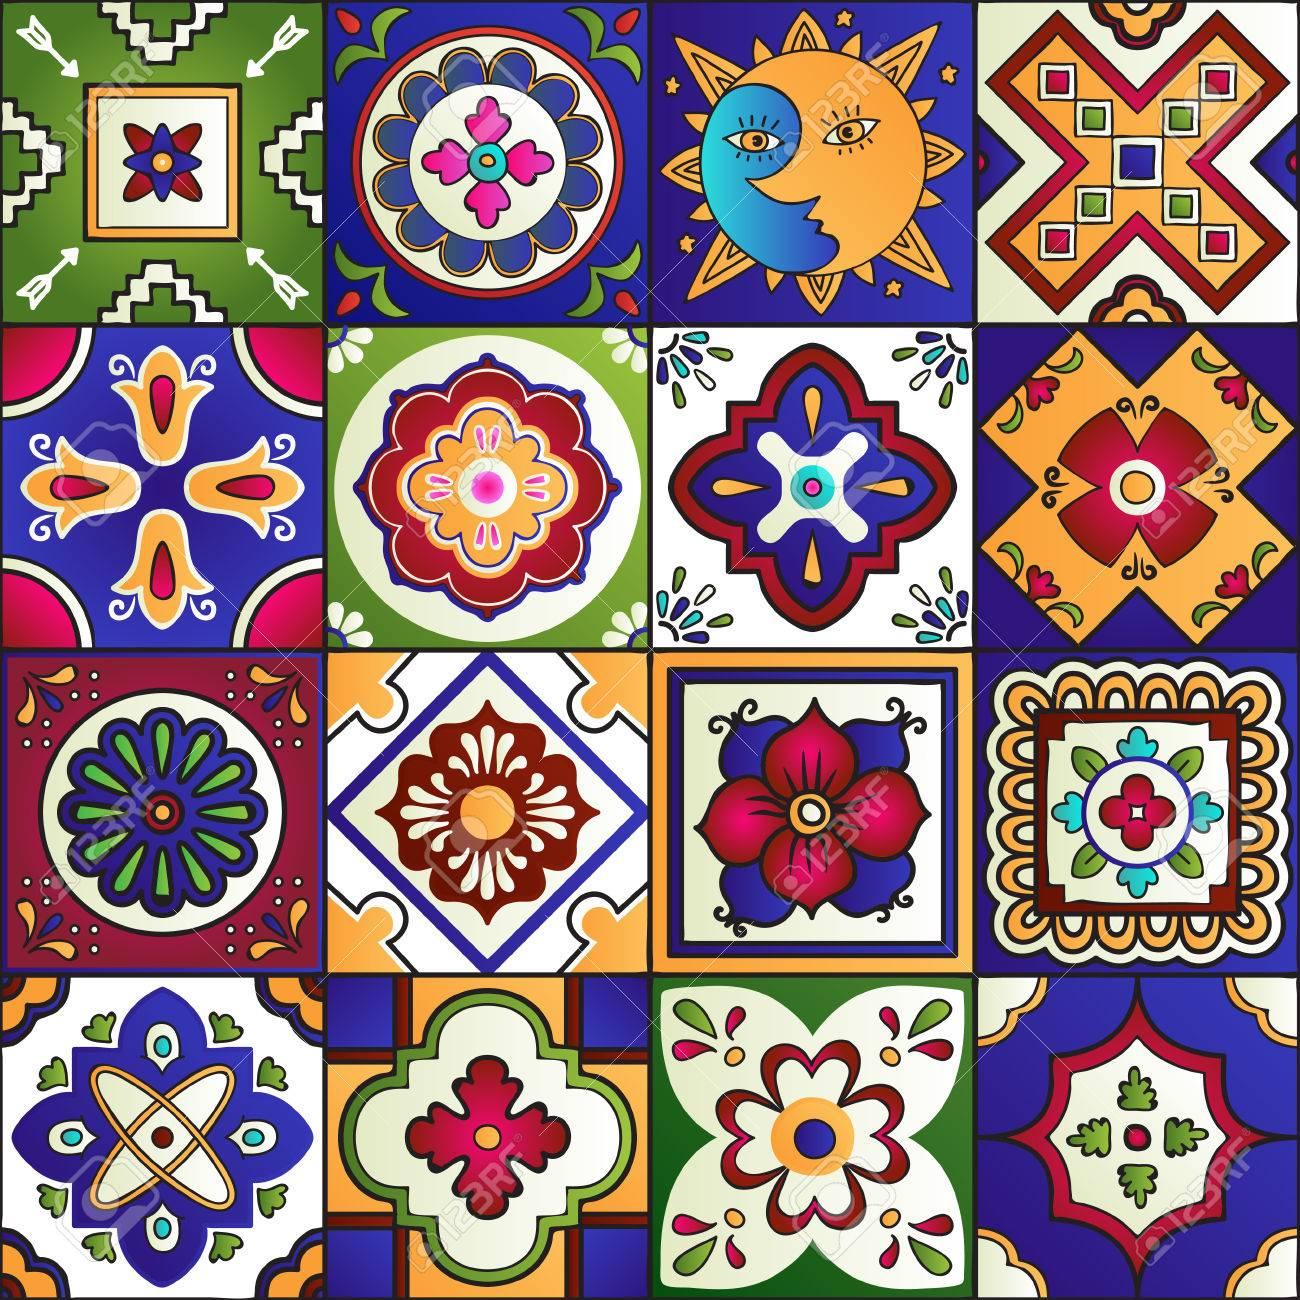 Talavera set of 16 mexican tiles. Seamless pattern - 51405632